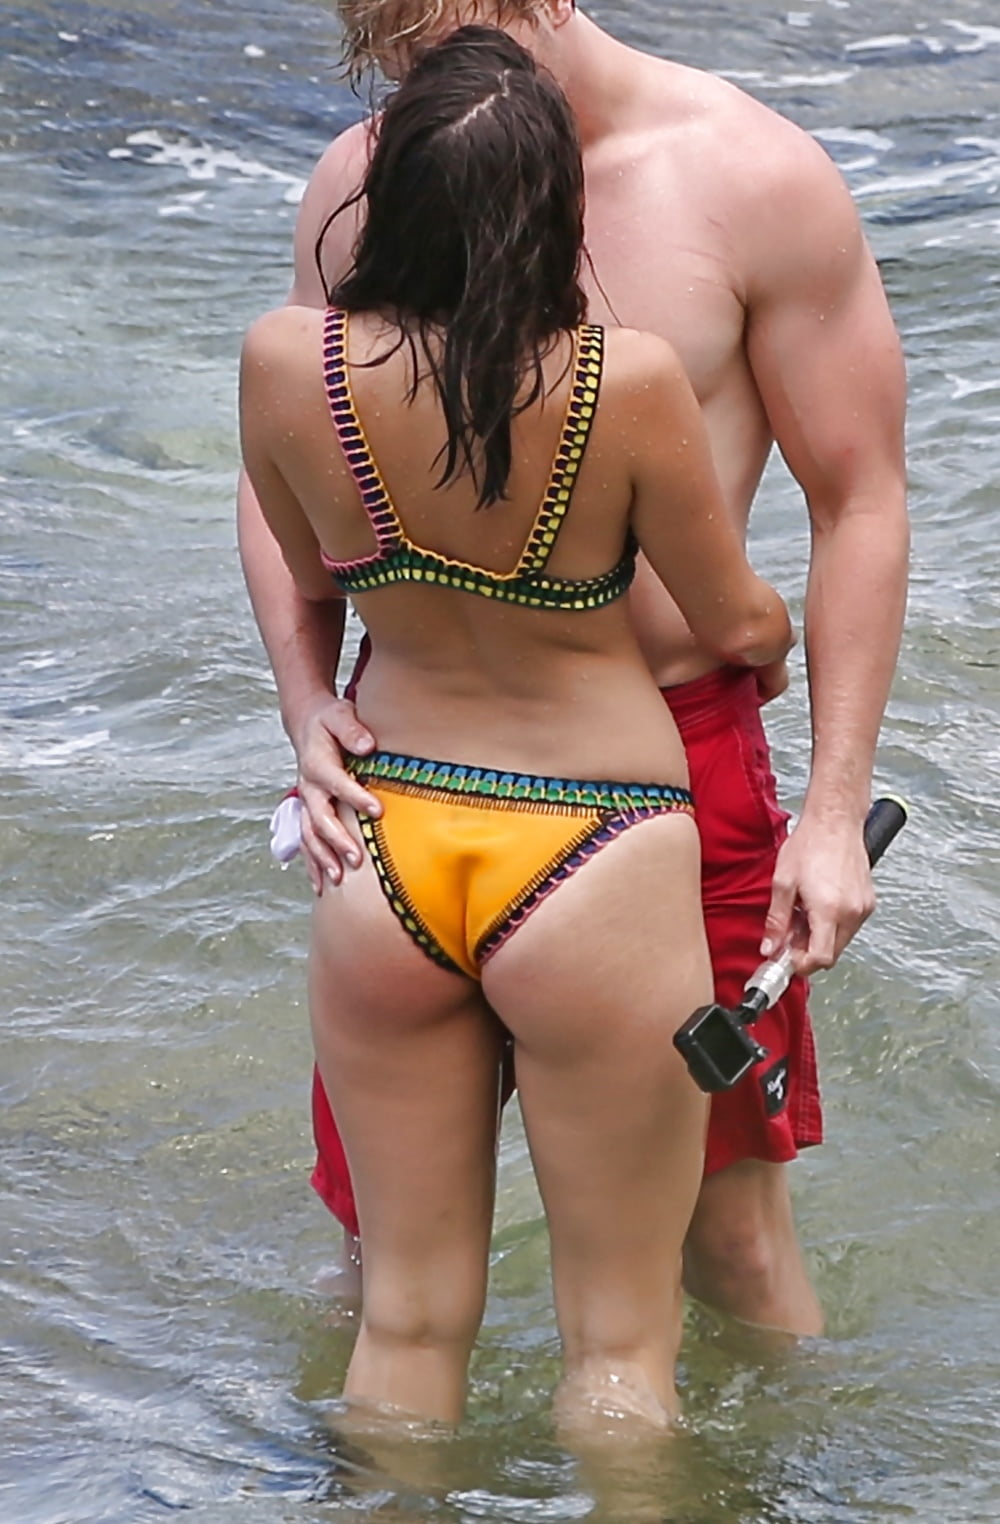 Casey anthony nude fake pics — 10